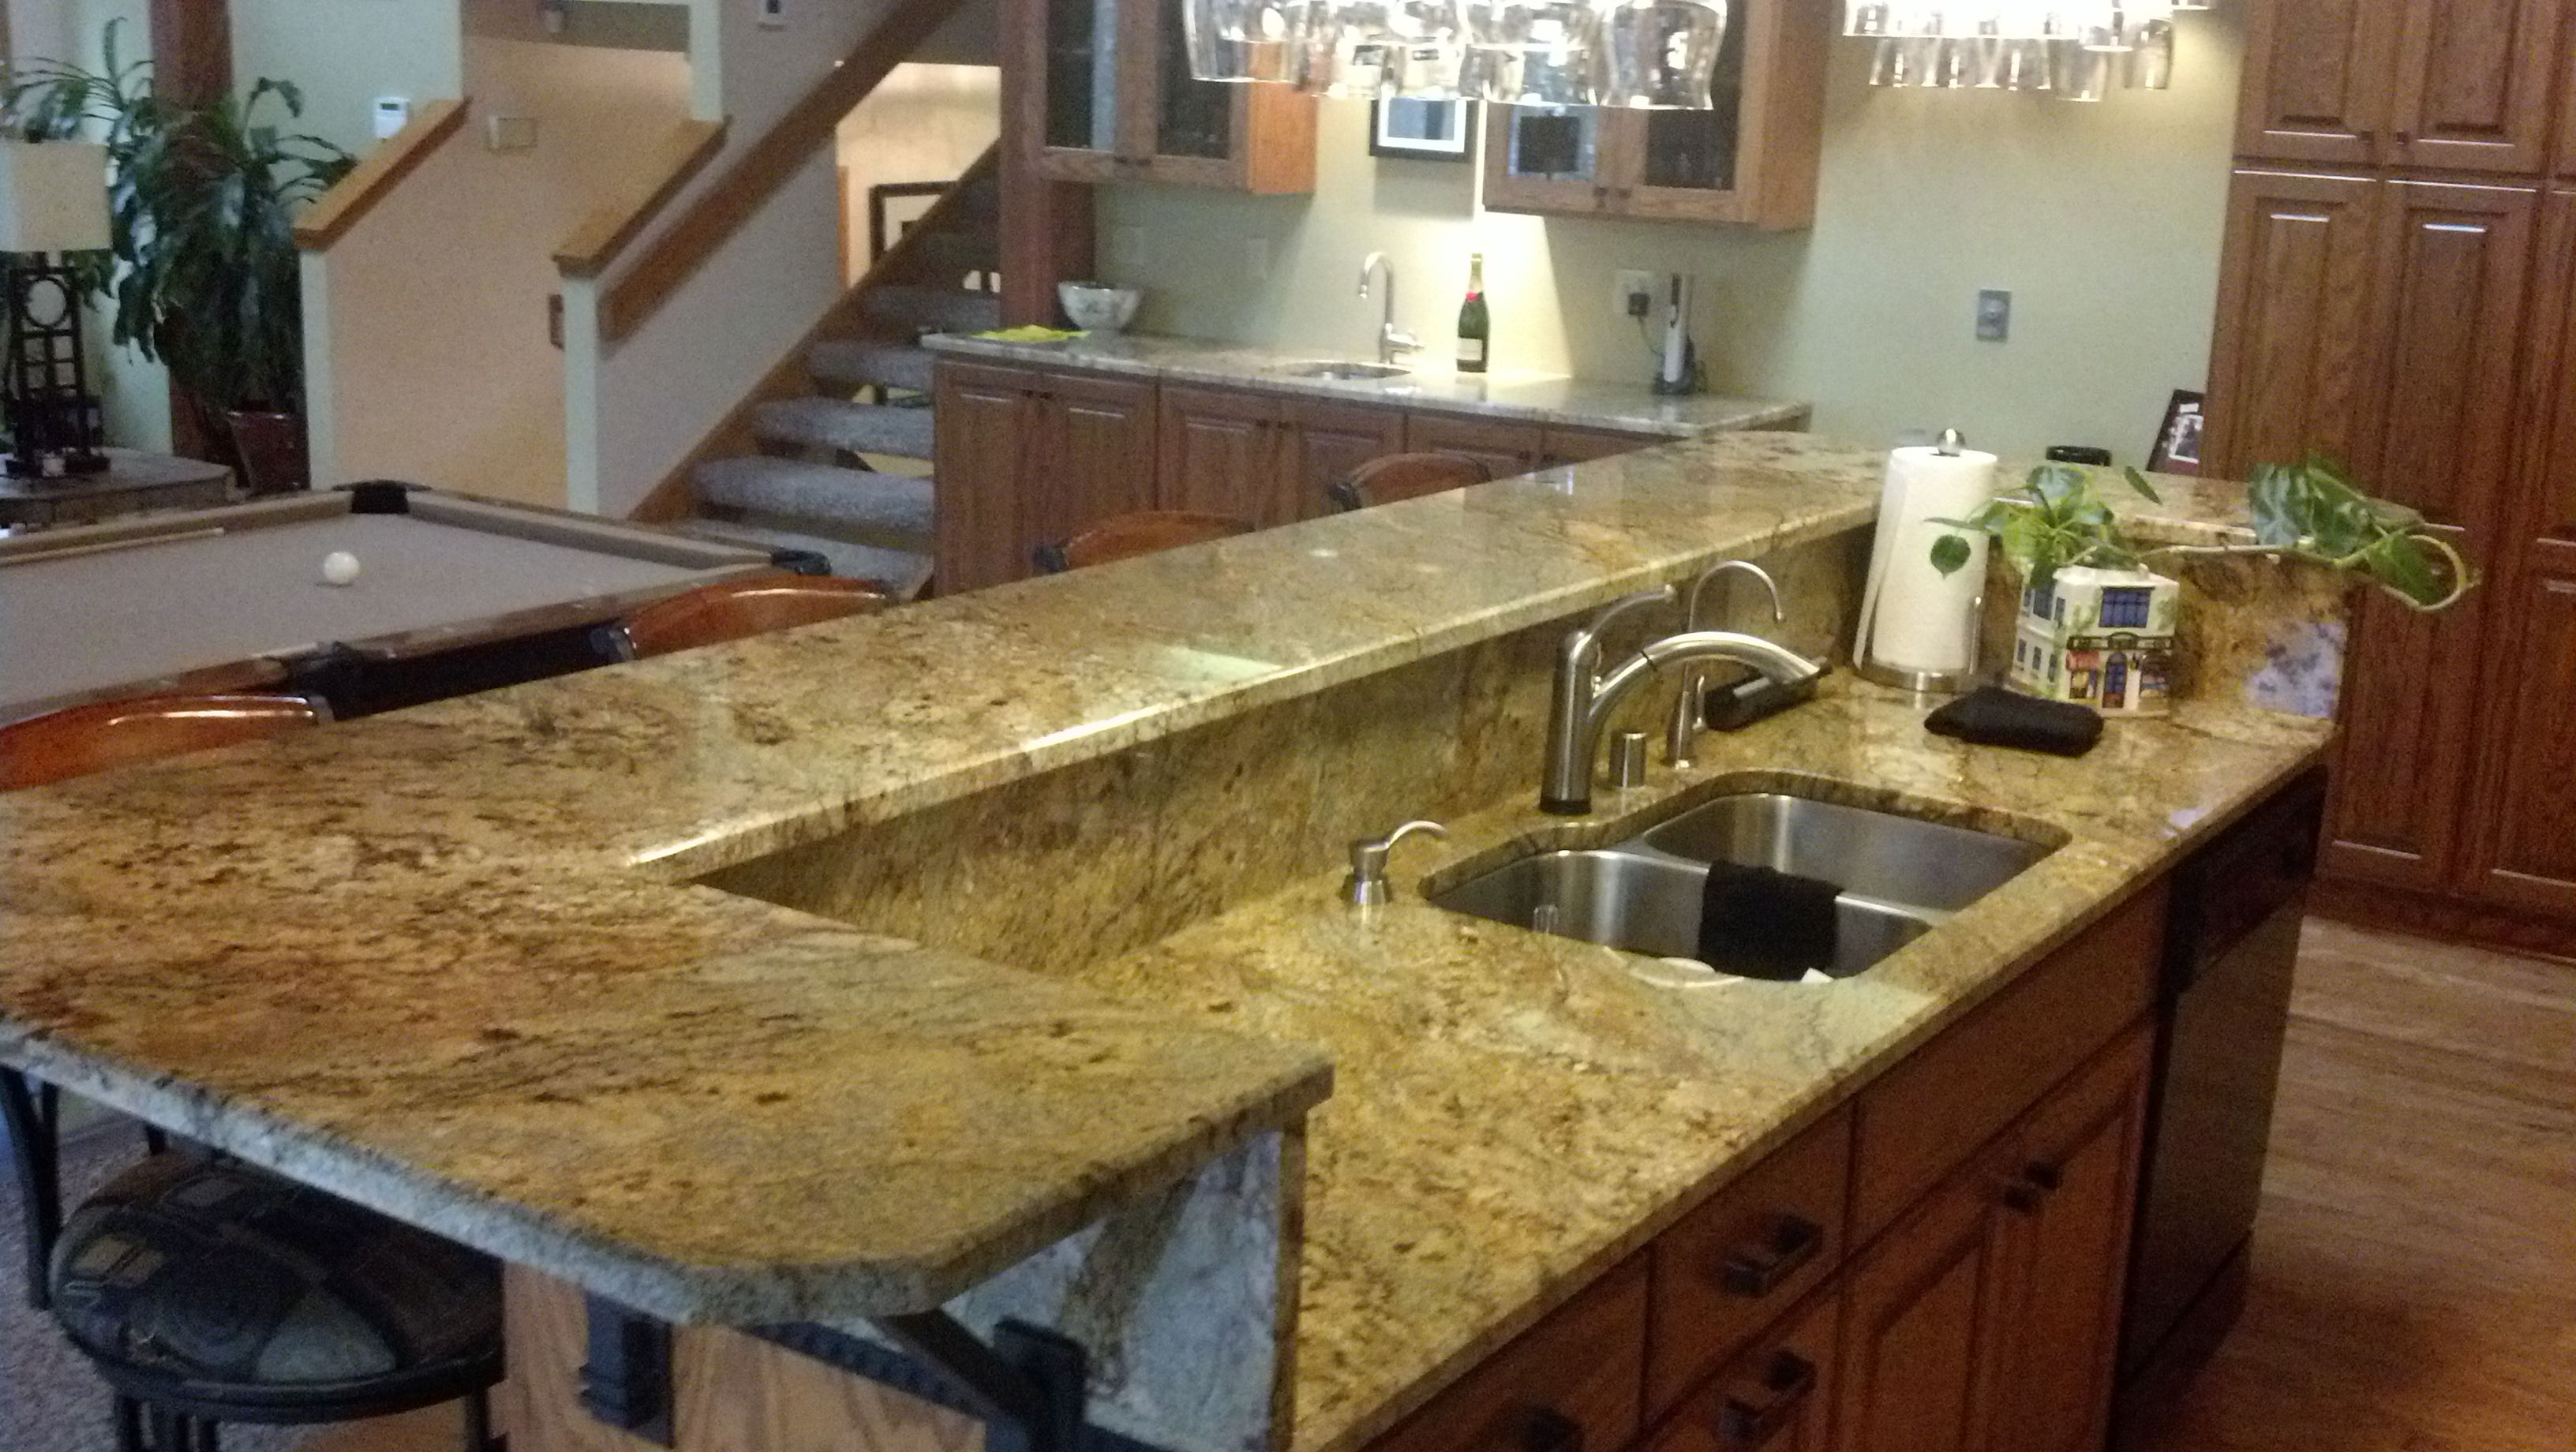 Golden Aurora Granite Kitchen With Raised Bar Remodel Design Done By Home Pride Remodeling Stone Done By Ho Kitchen Bar Trendy Kitchen Cheap Kitchen Makeover